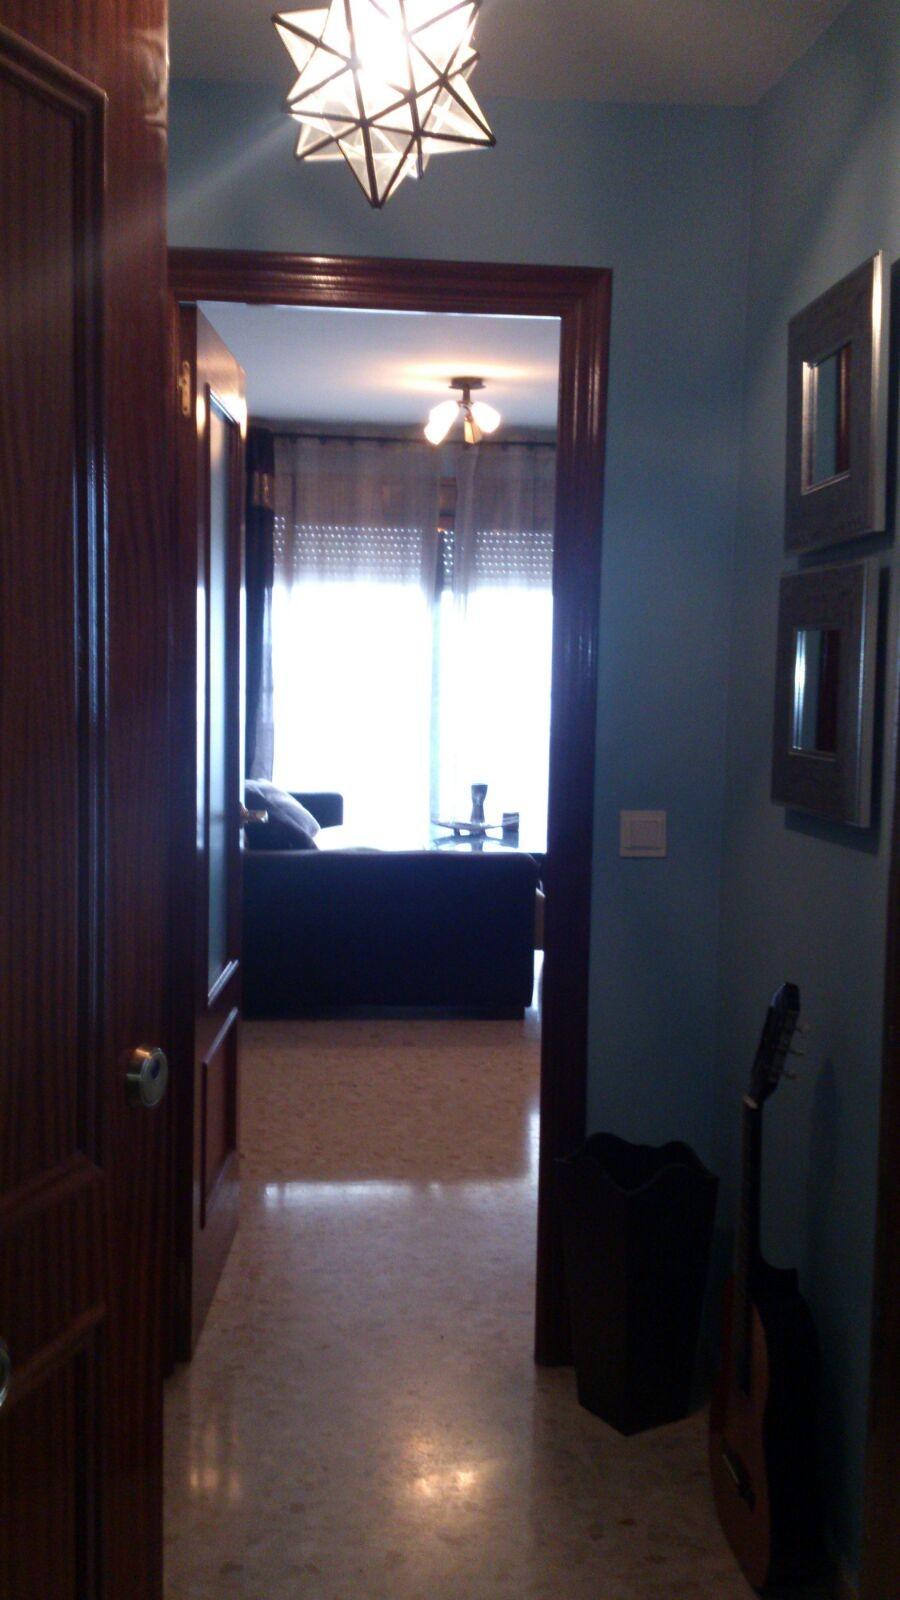 Alquiler de bonita habitaci n en piso compartido Alquiler de habitacion en piso compartido